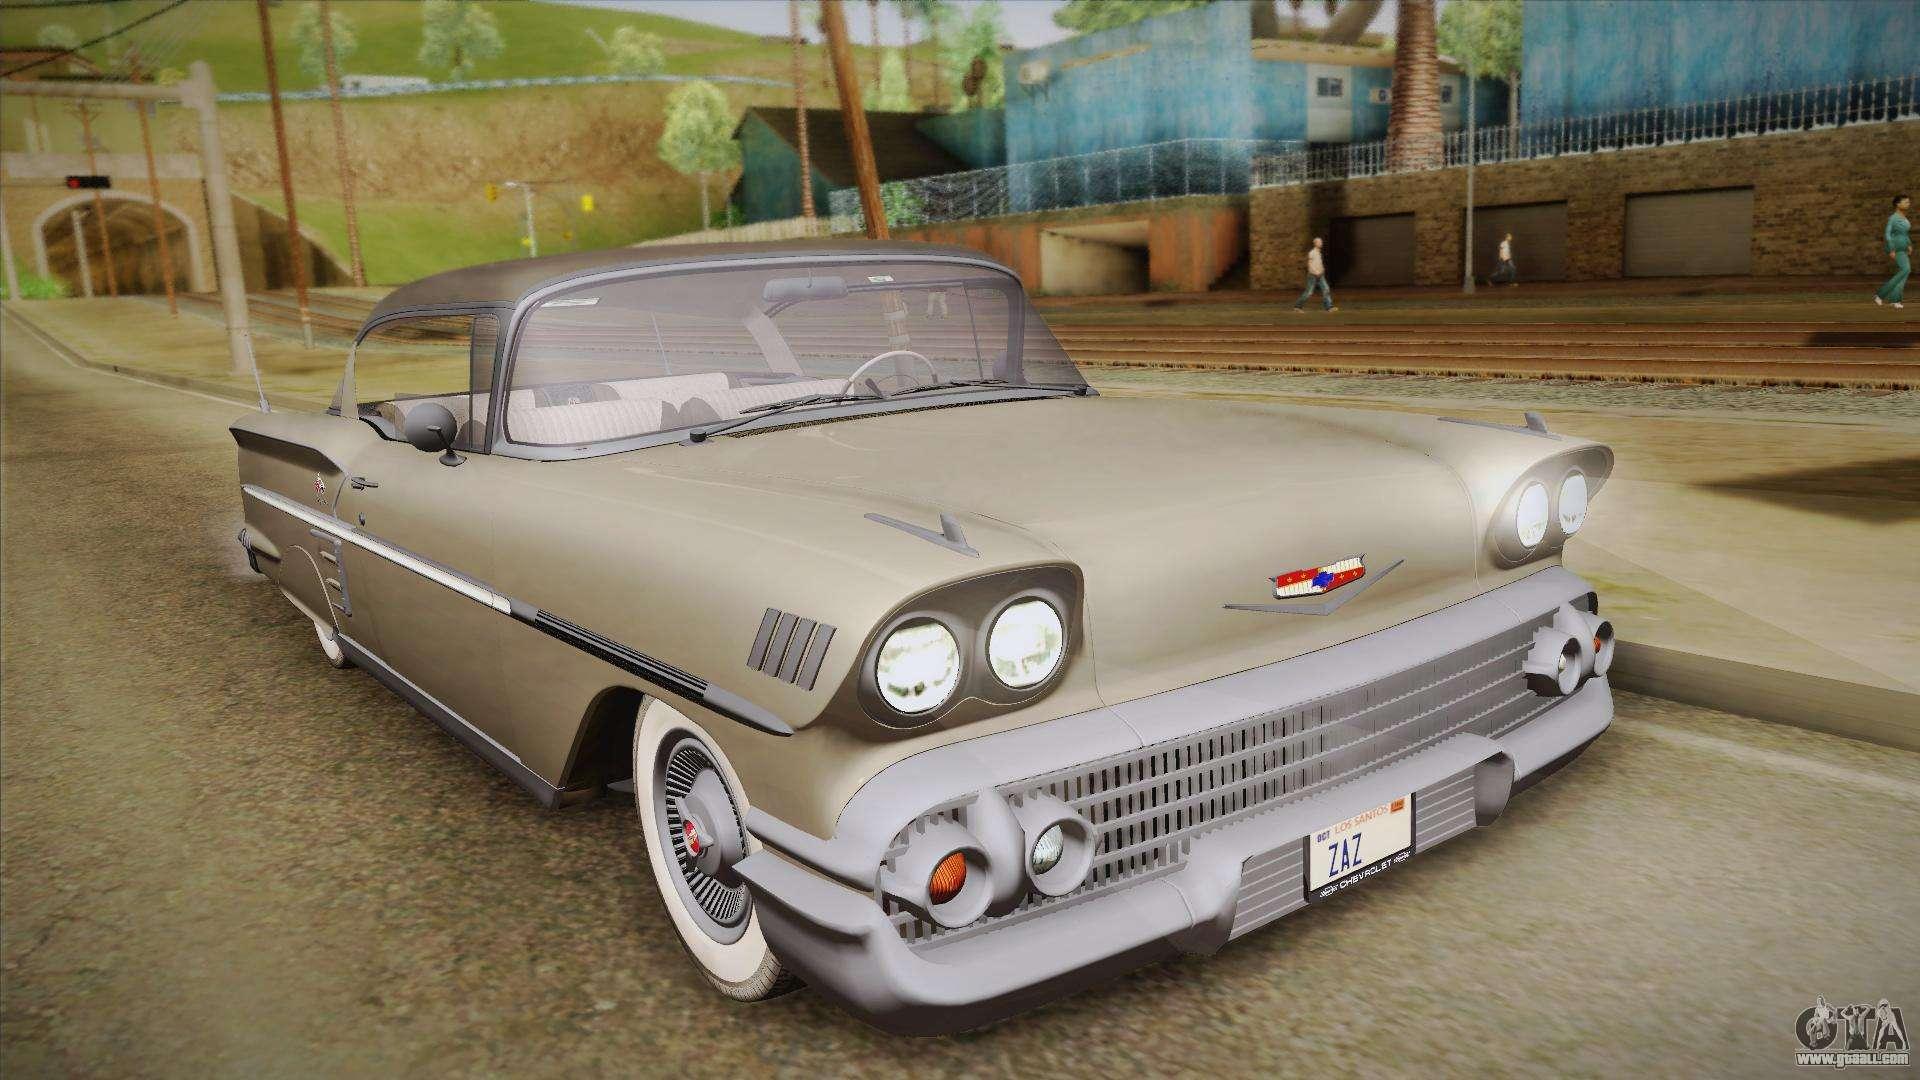 Chevrolet impala 4 door hardtop 1963 for gta san andreas - Chevrolet Impala Sport Coupe V8 1958 Hqlm For Gta San Andreas